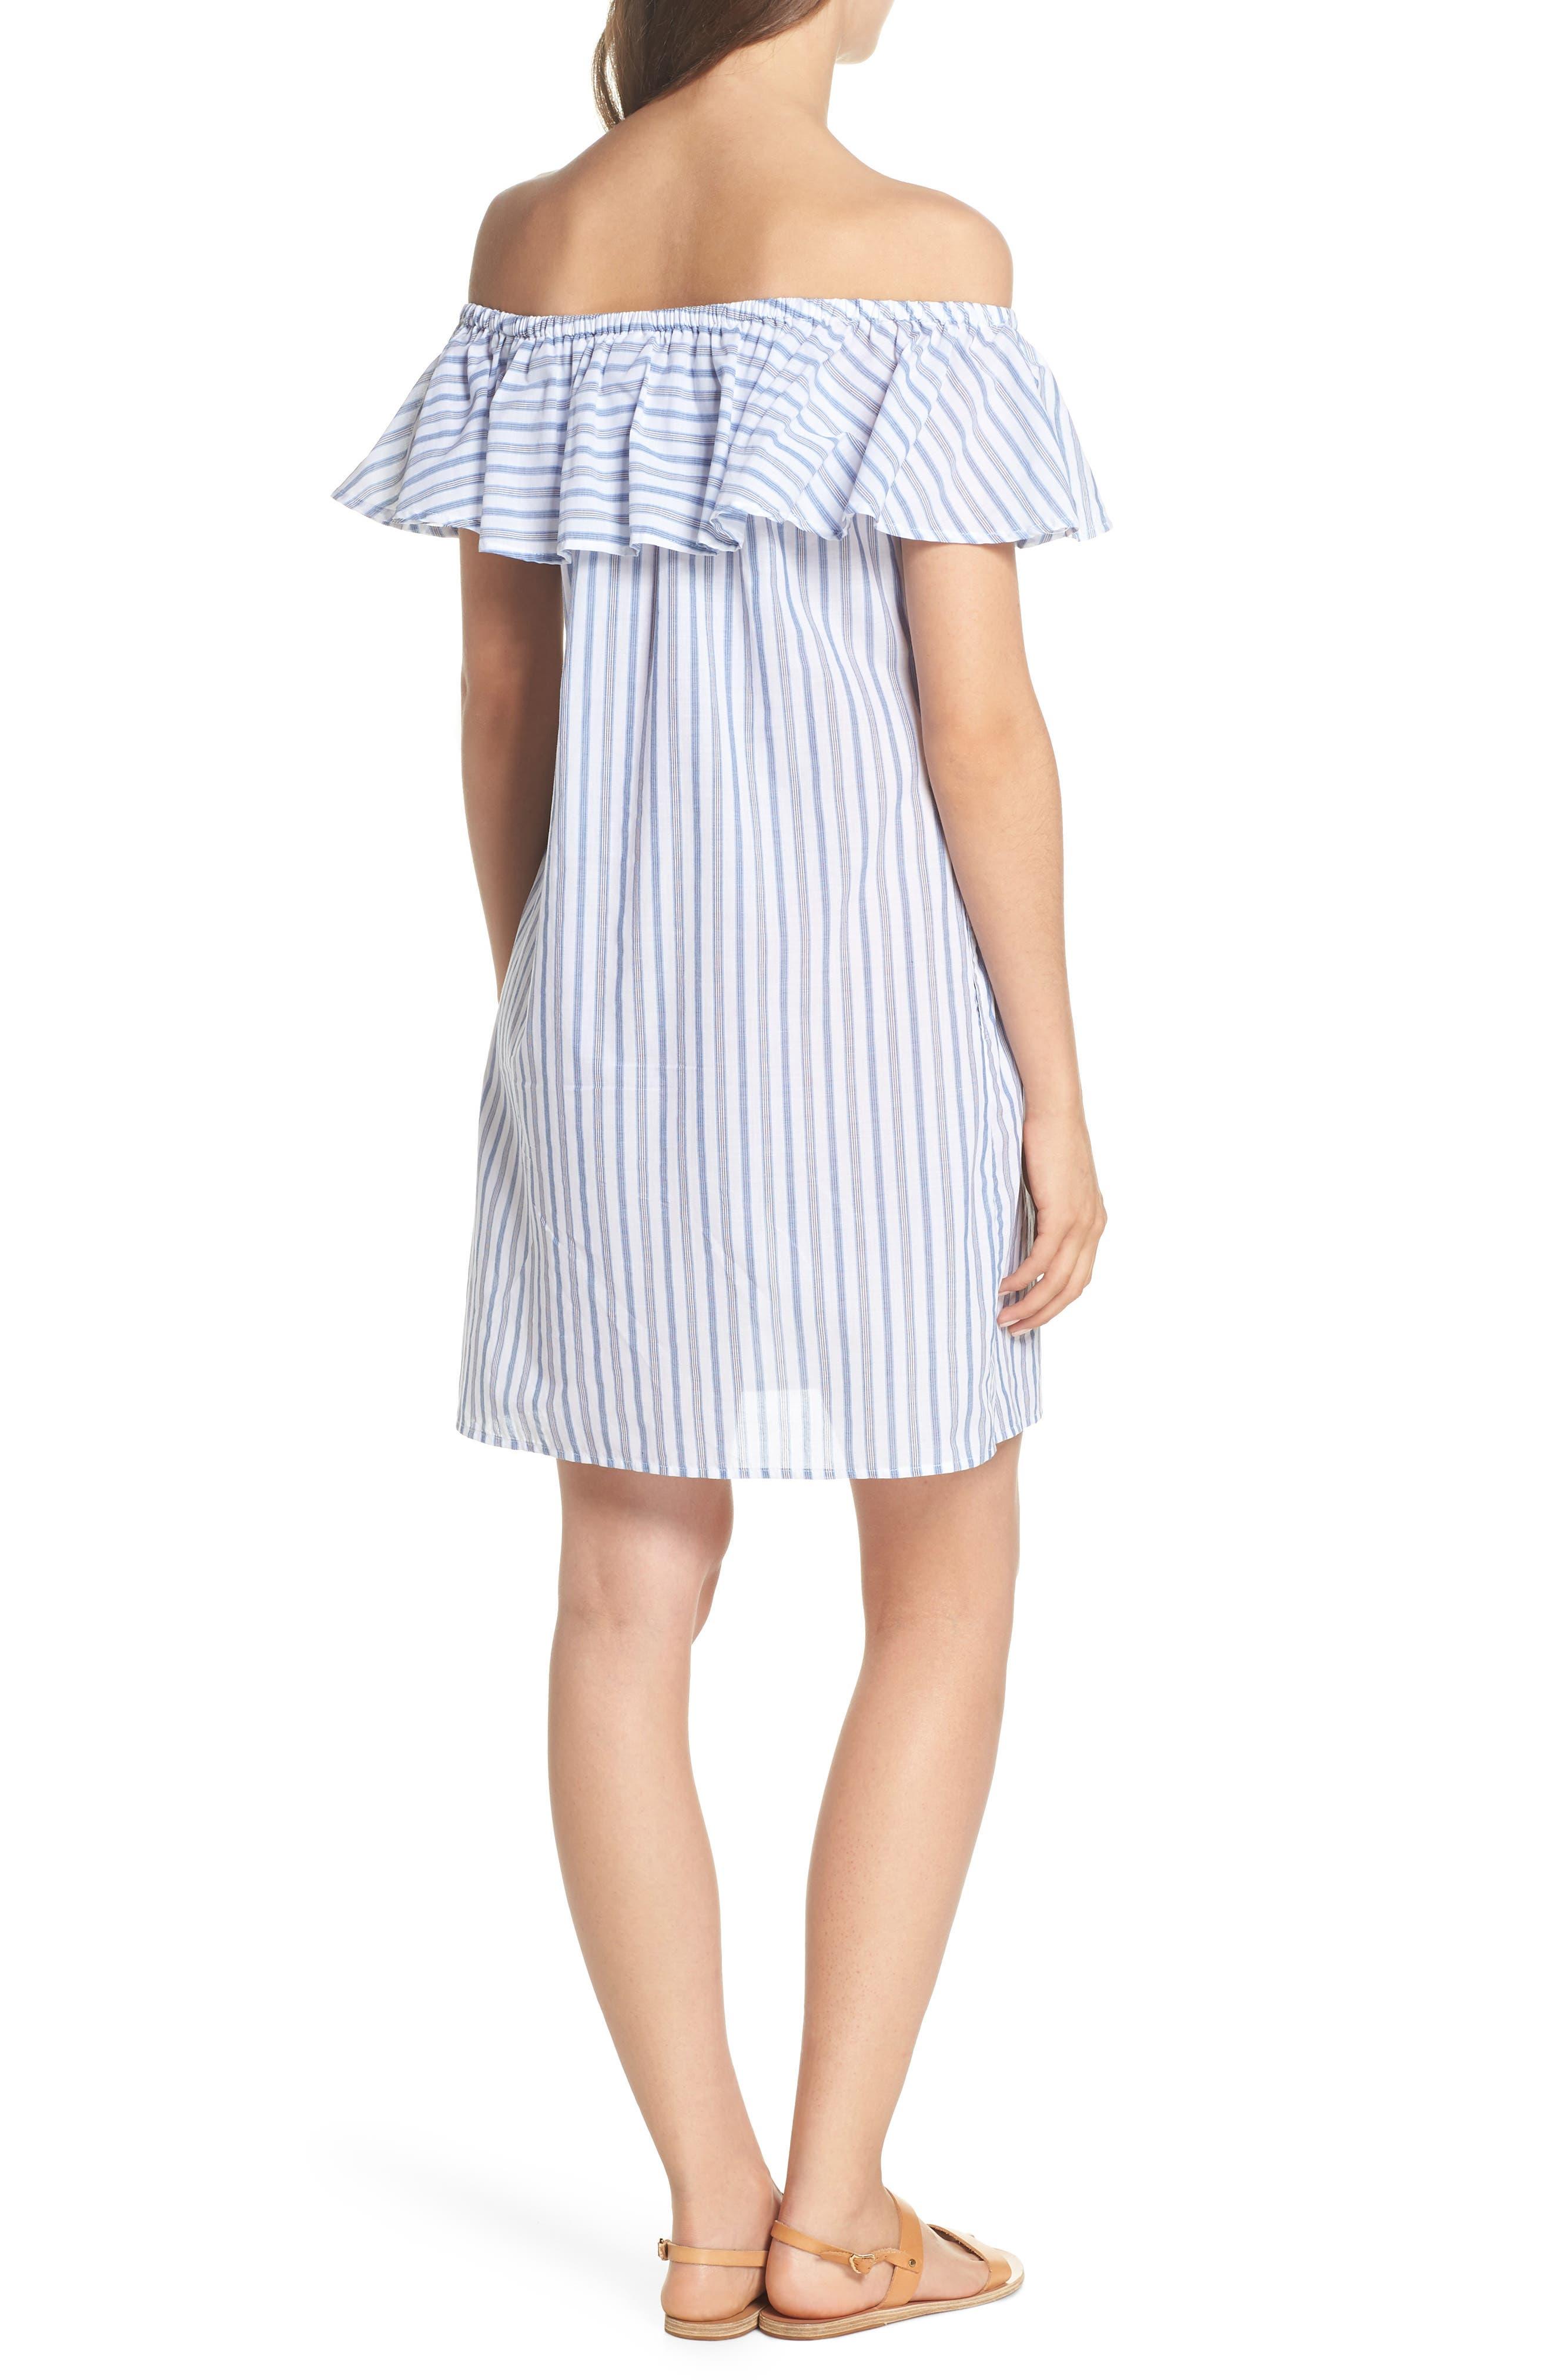 Ticking Stripe Off the Shoulder Cover-Up Dress,                             Alternate thumbnail 2, color,                             100